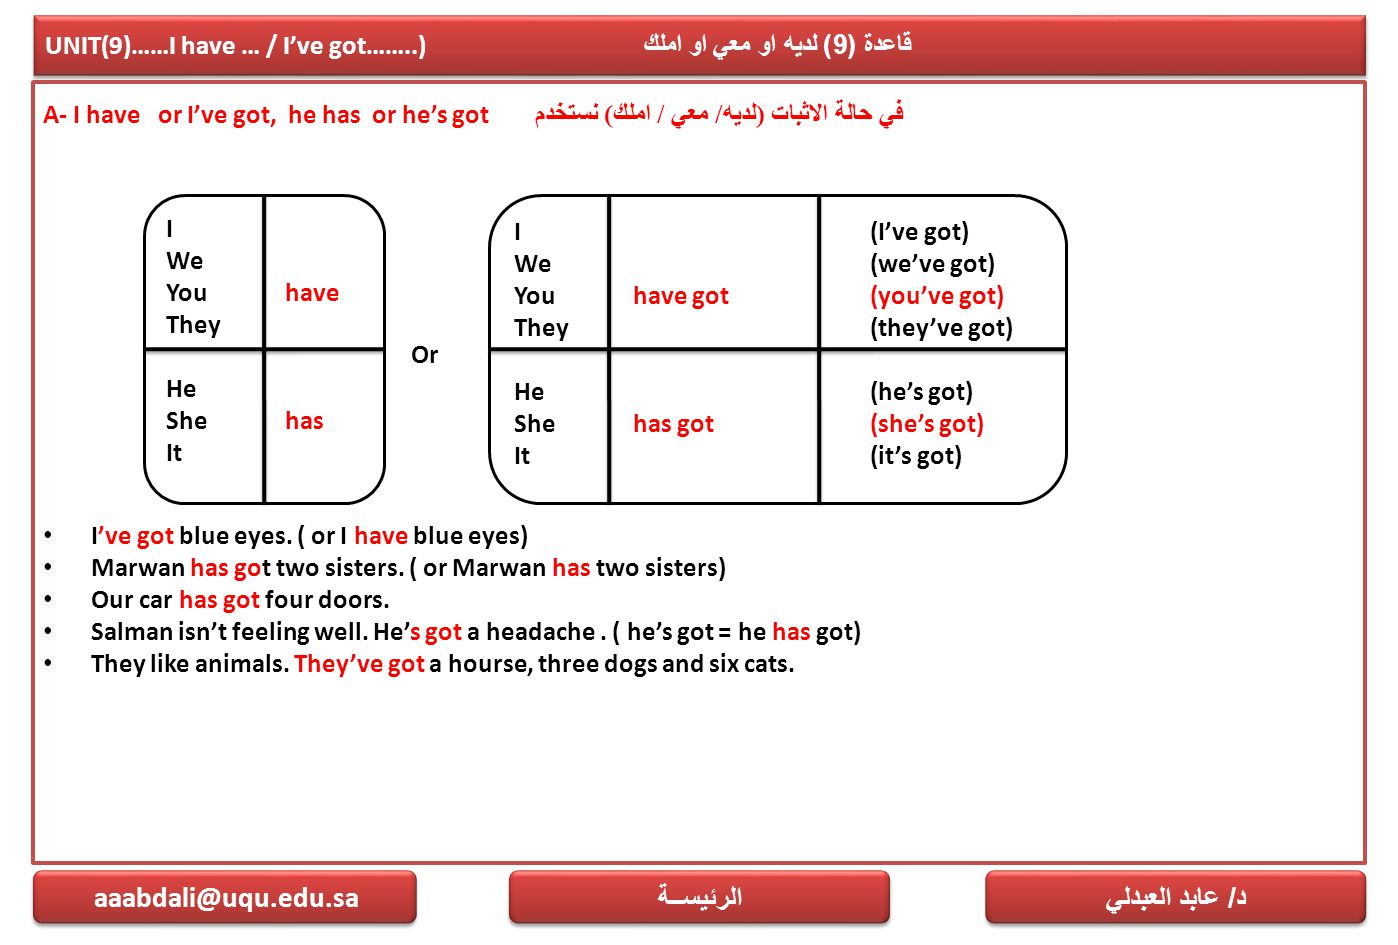 UNIT(9)……I have … / I've got……..) قاعدة (9) لديه او معي او املك